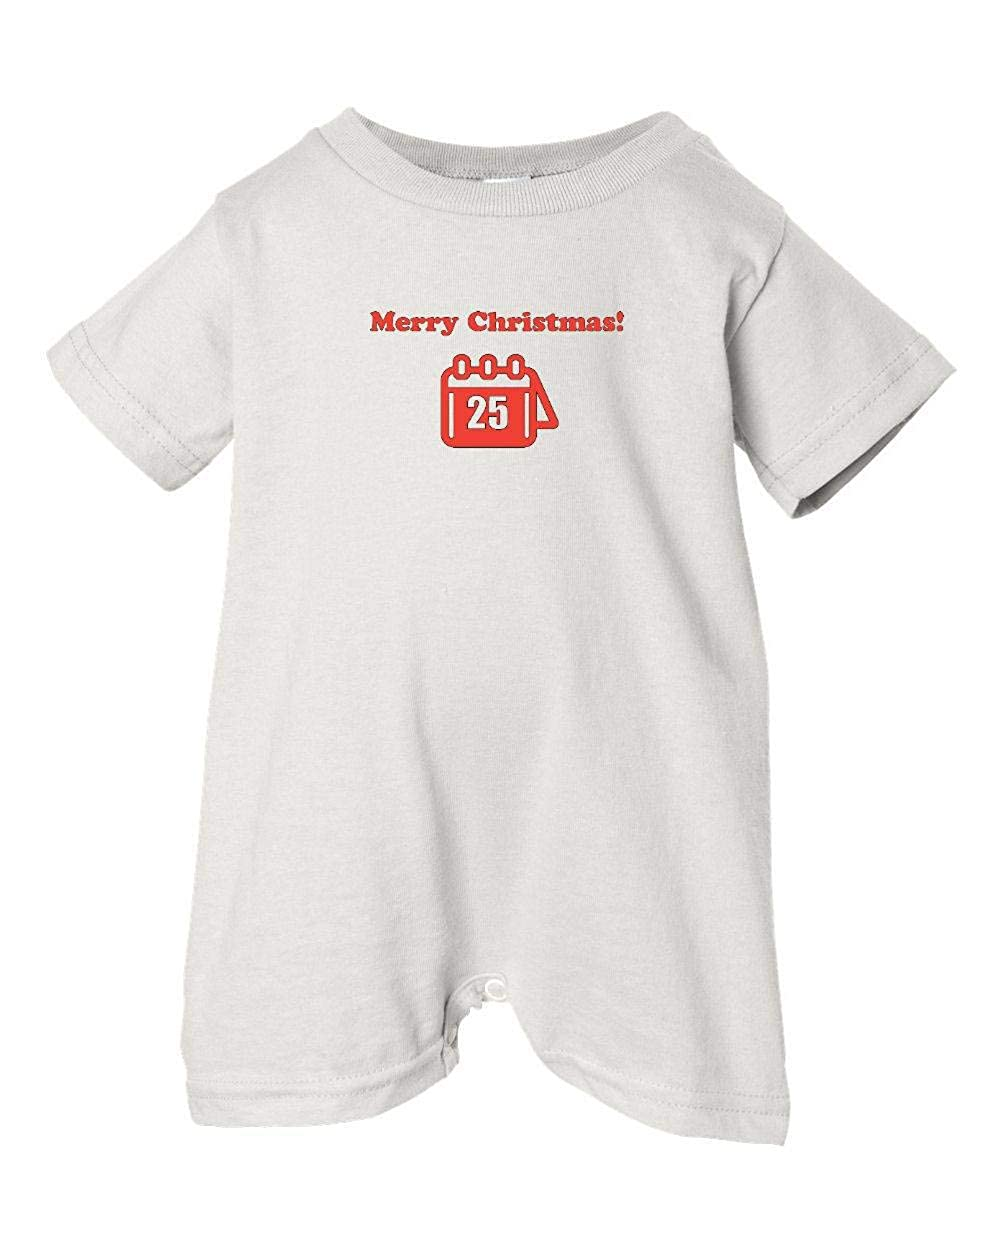 T-Shirt Romper Calendar White, 18 Months Festive Threads Unisex Baby Merry Christmas!